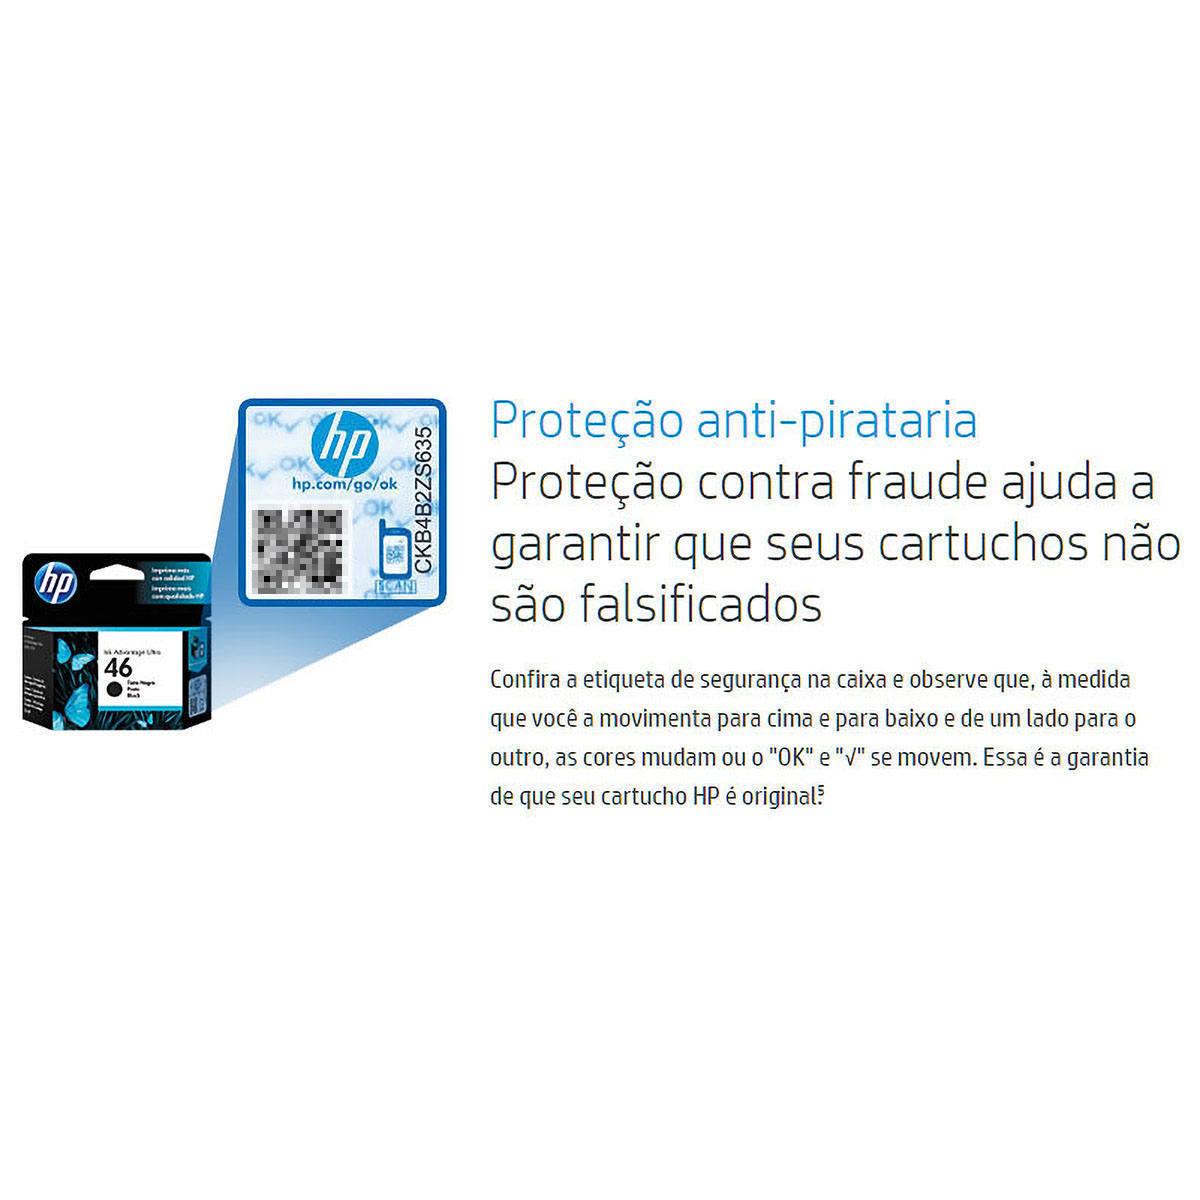 Kit Cartucho de Tinta HP 21 Preto + 22 Colorido para HP Officejet J3680 Deskjet D1560 F2180 F4180 F2224 1410 Original